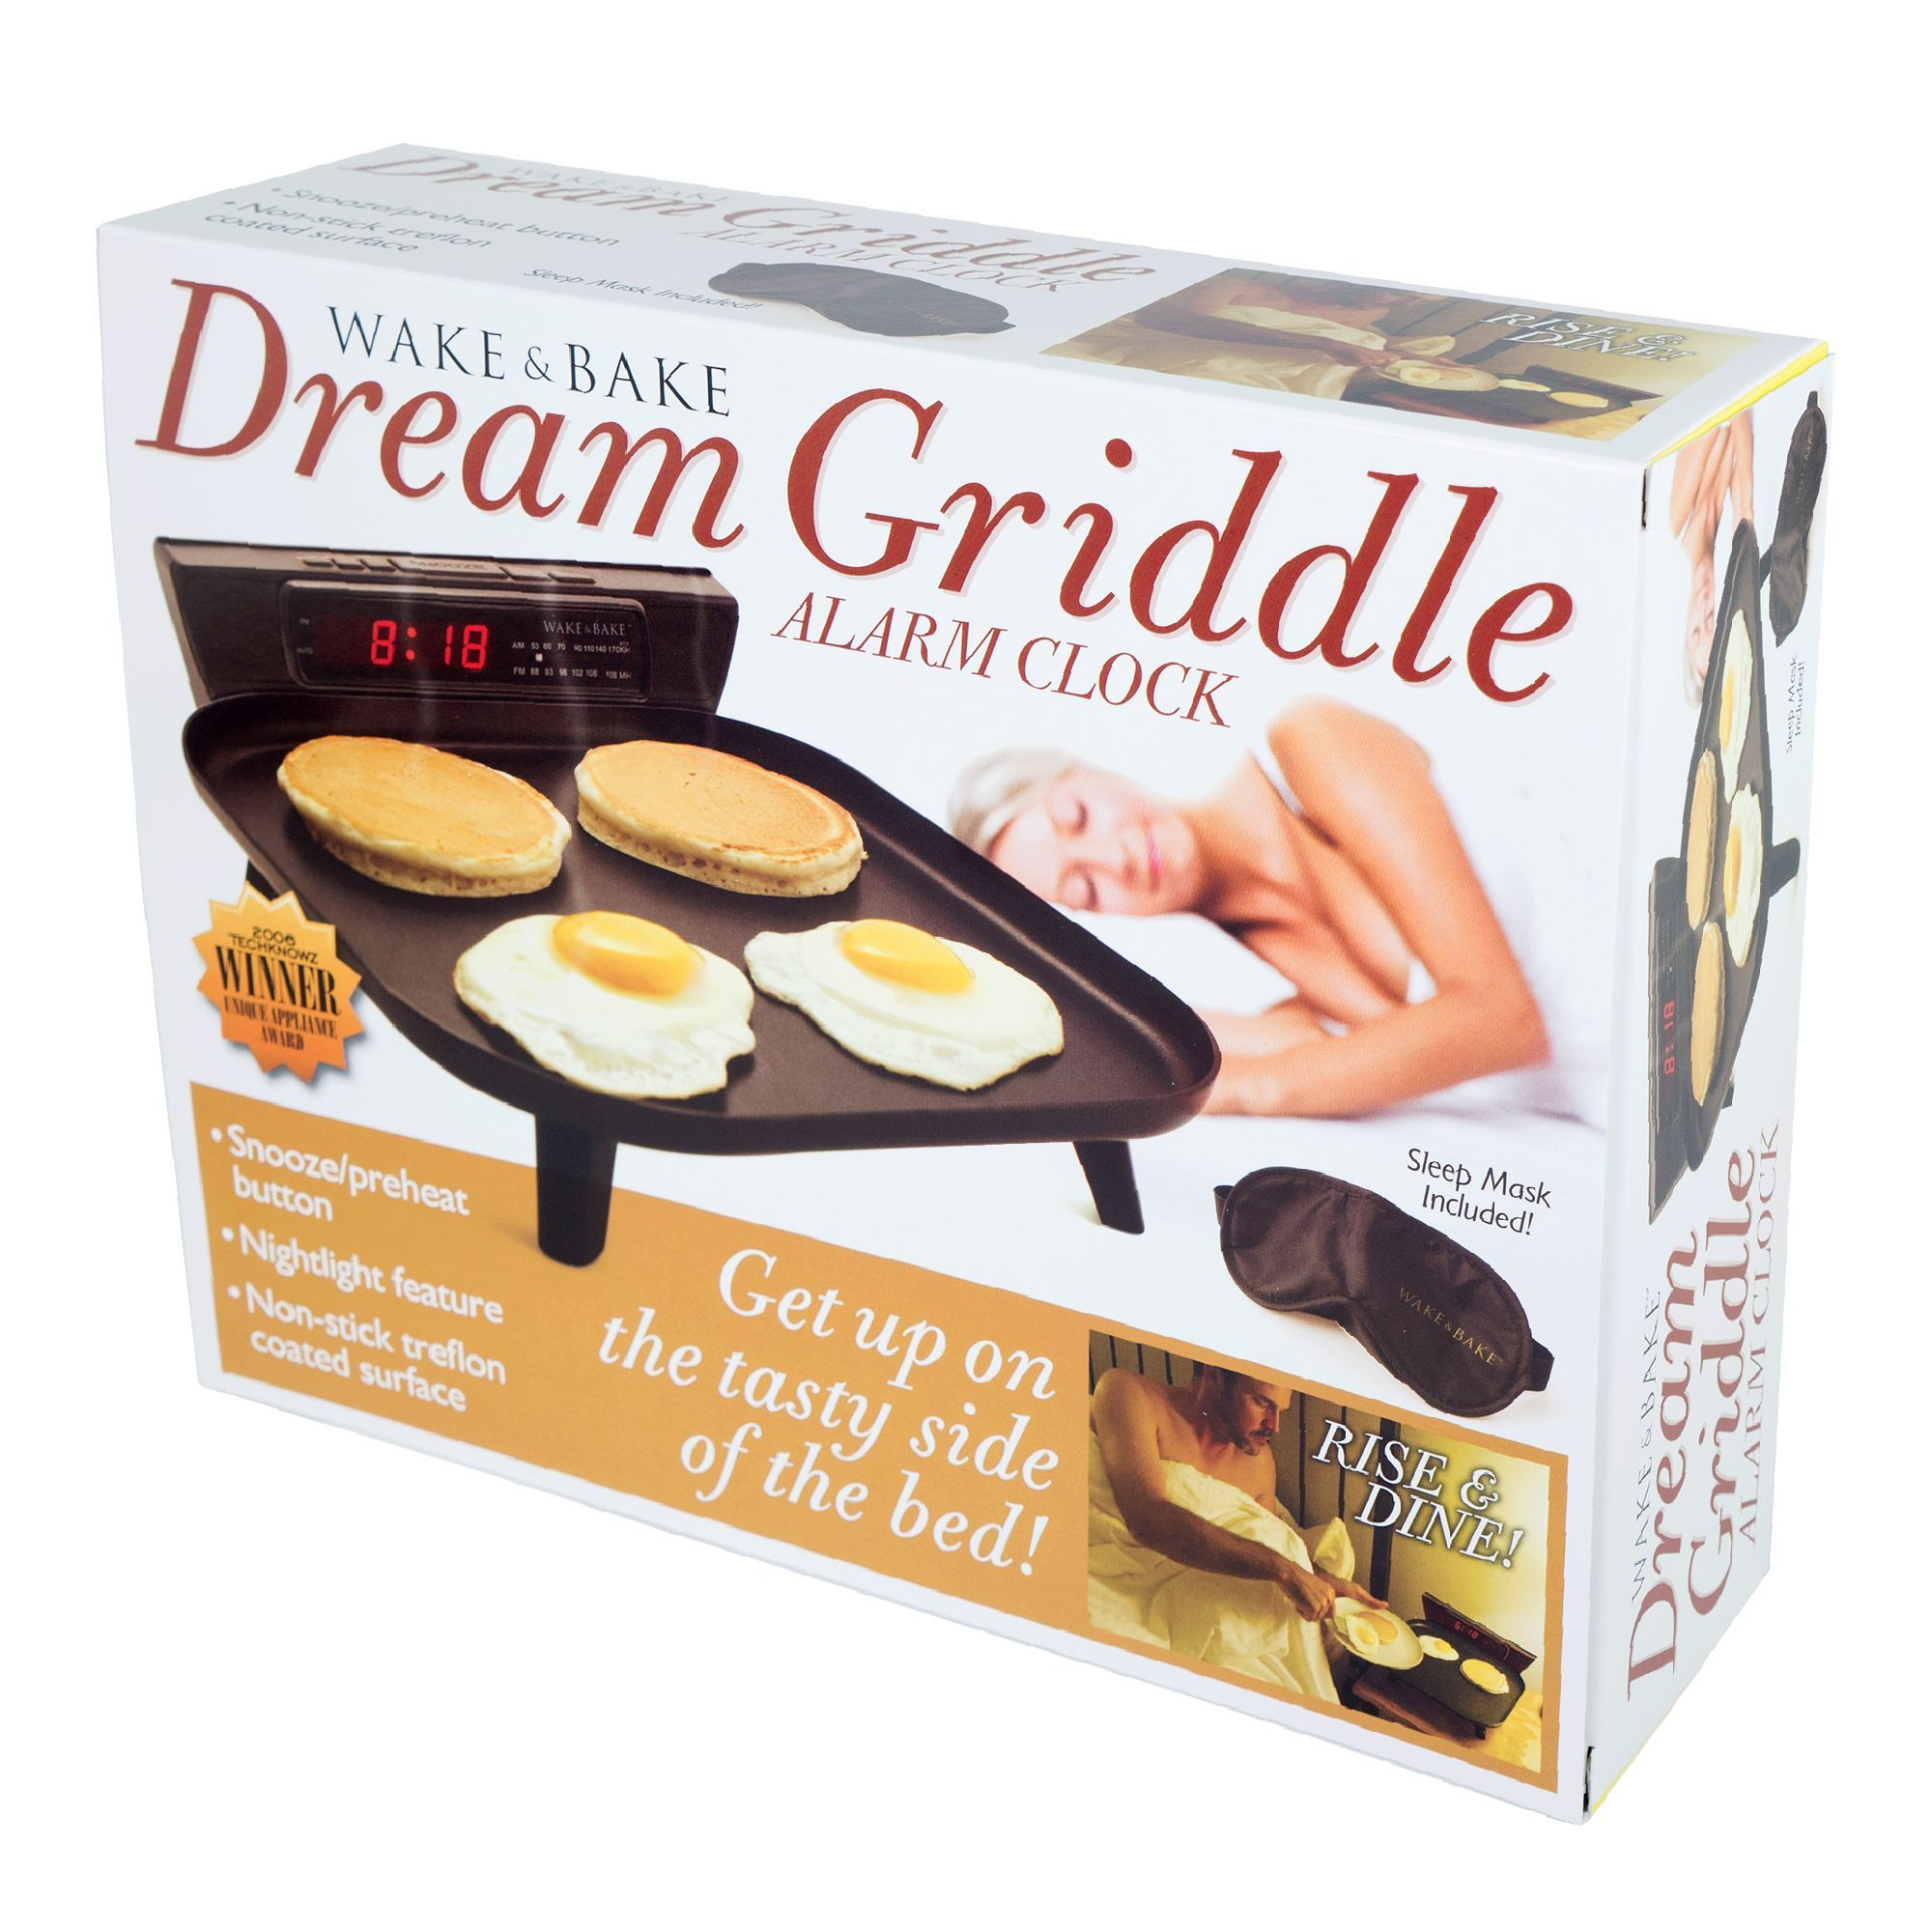 Dream griddleclock standard size prank gift boxes